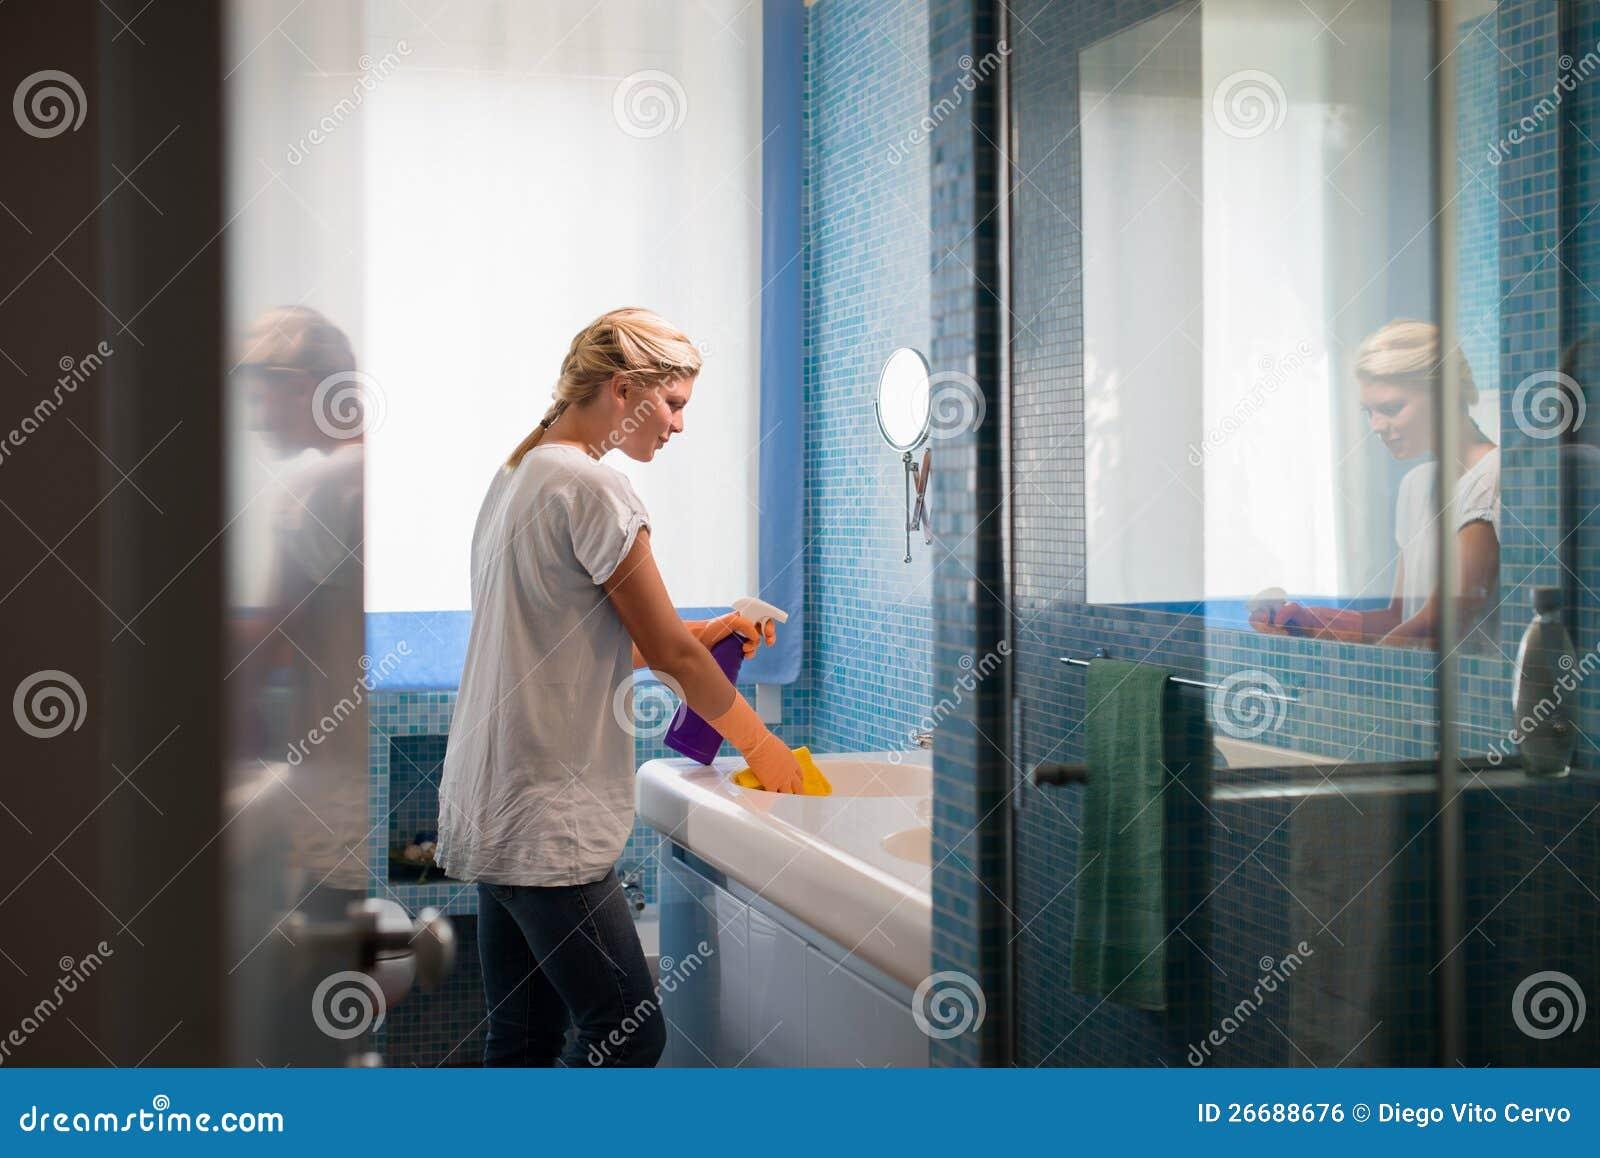 Vrouw die karweien thuis doet en badkamers schoonmaakt